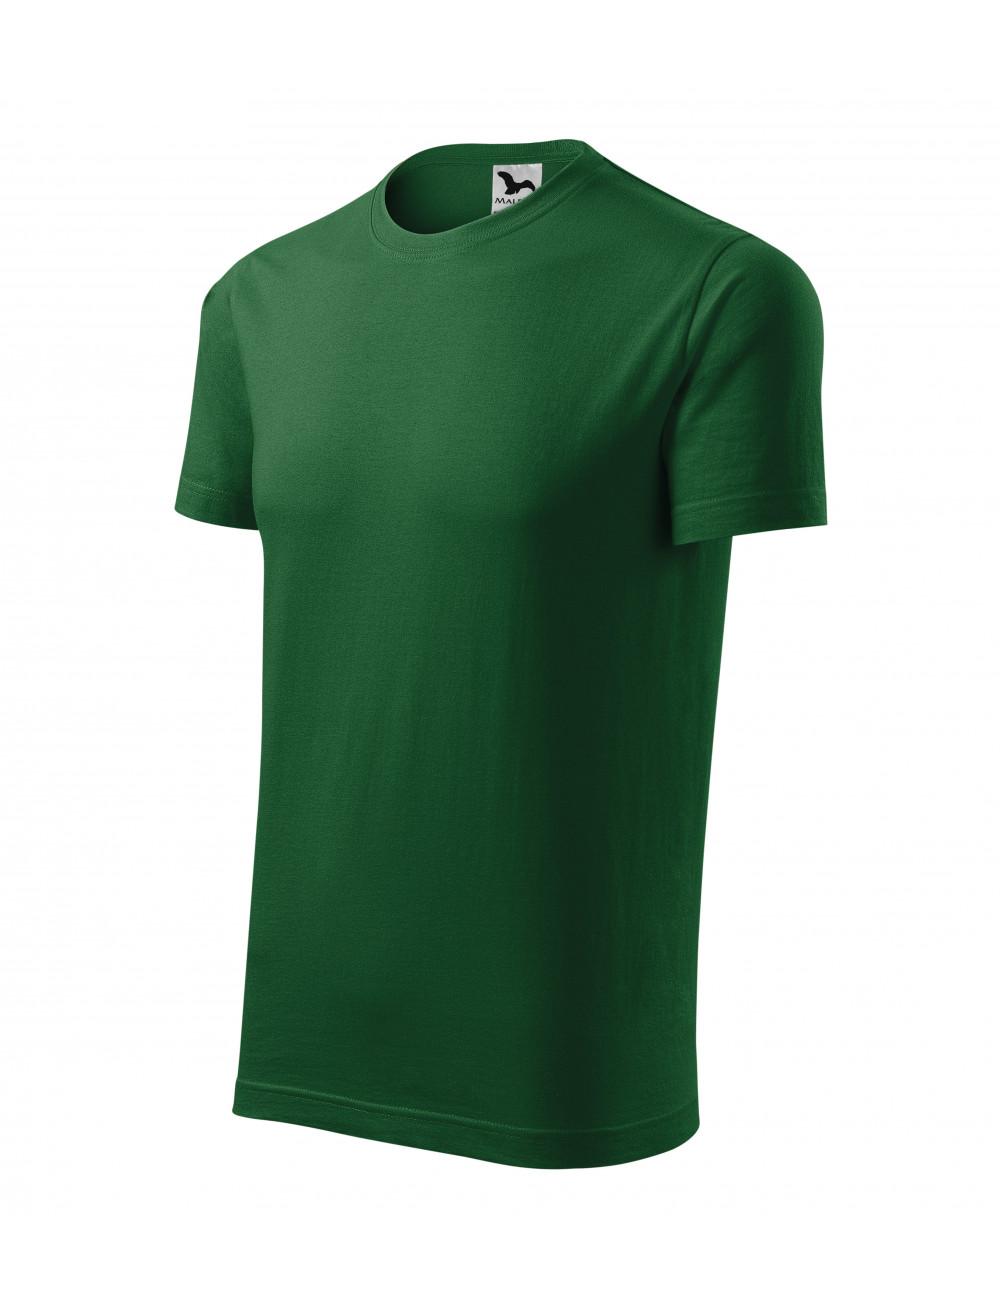 Adler MALFINI Koszulka unisex Element 145 zieleń butelkowa